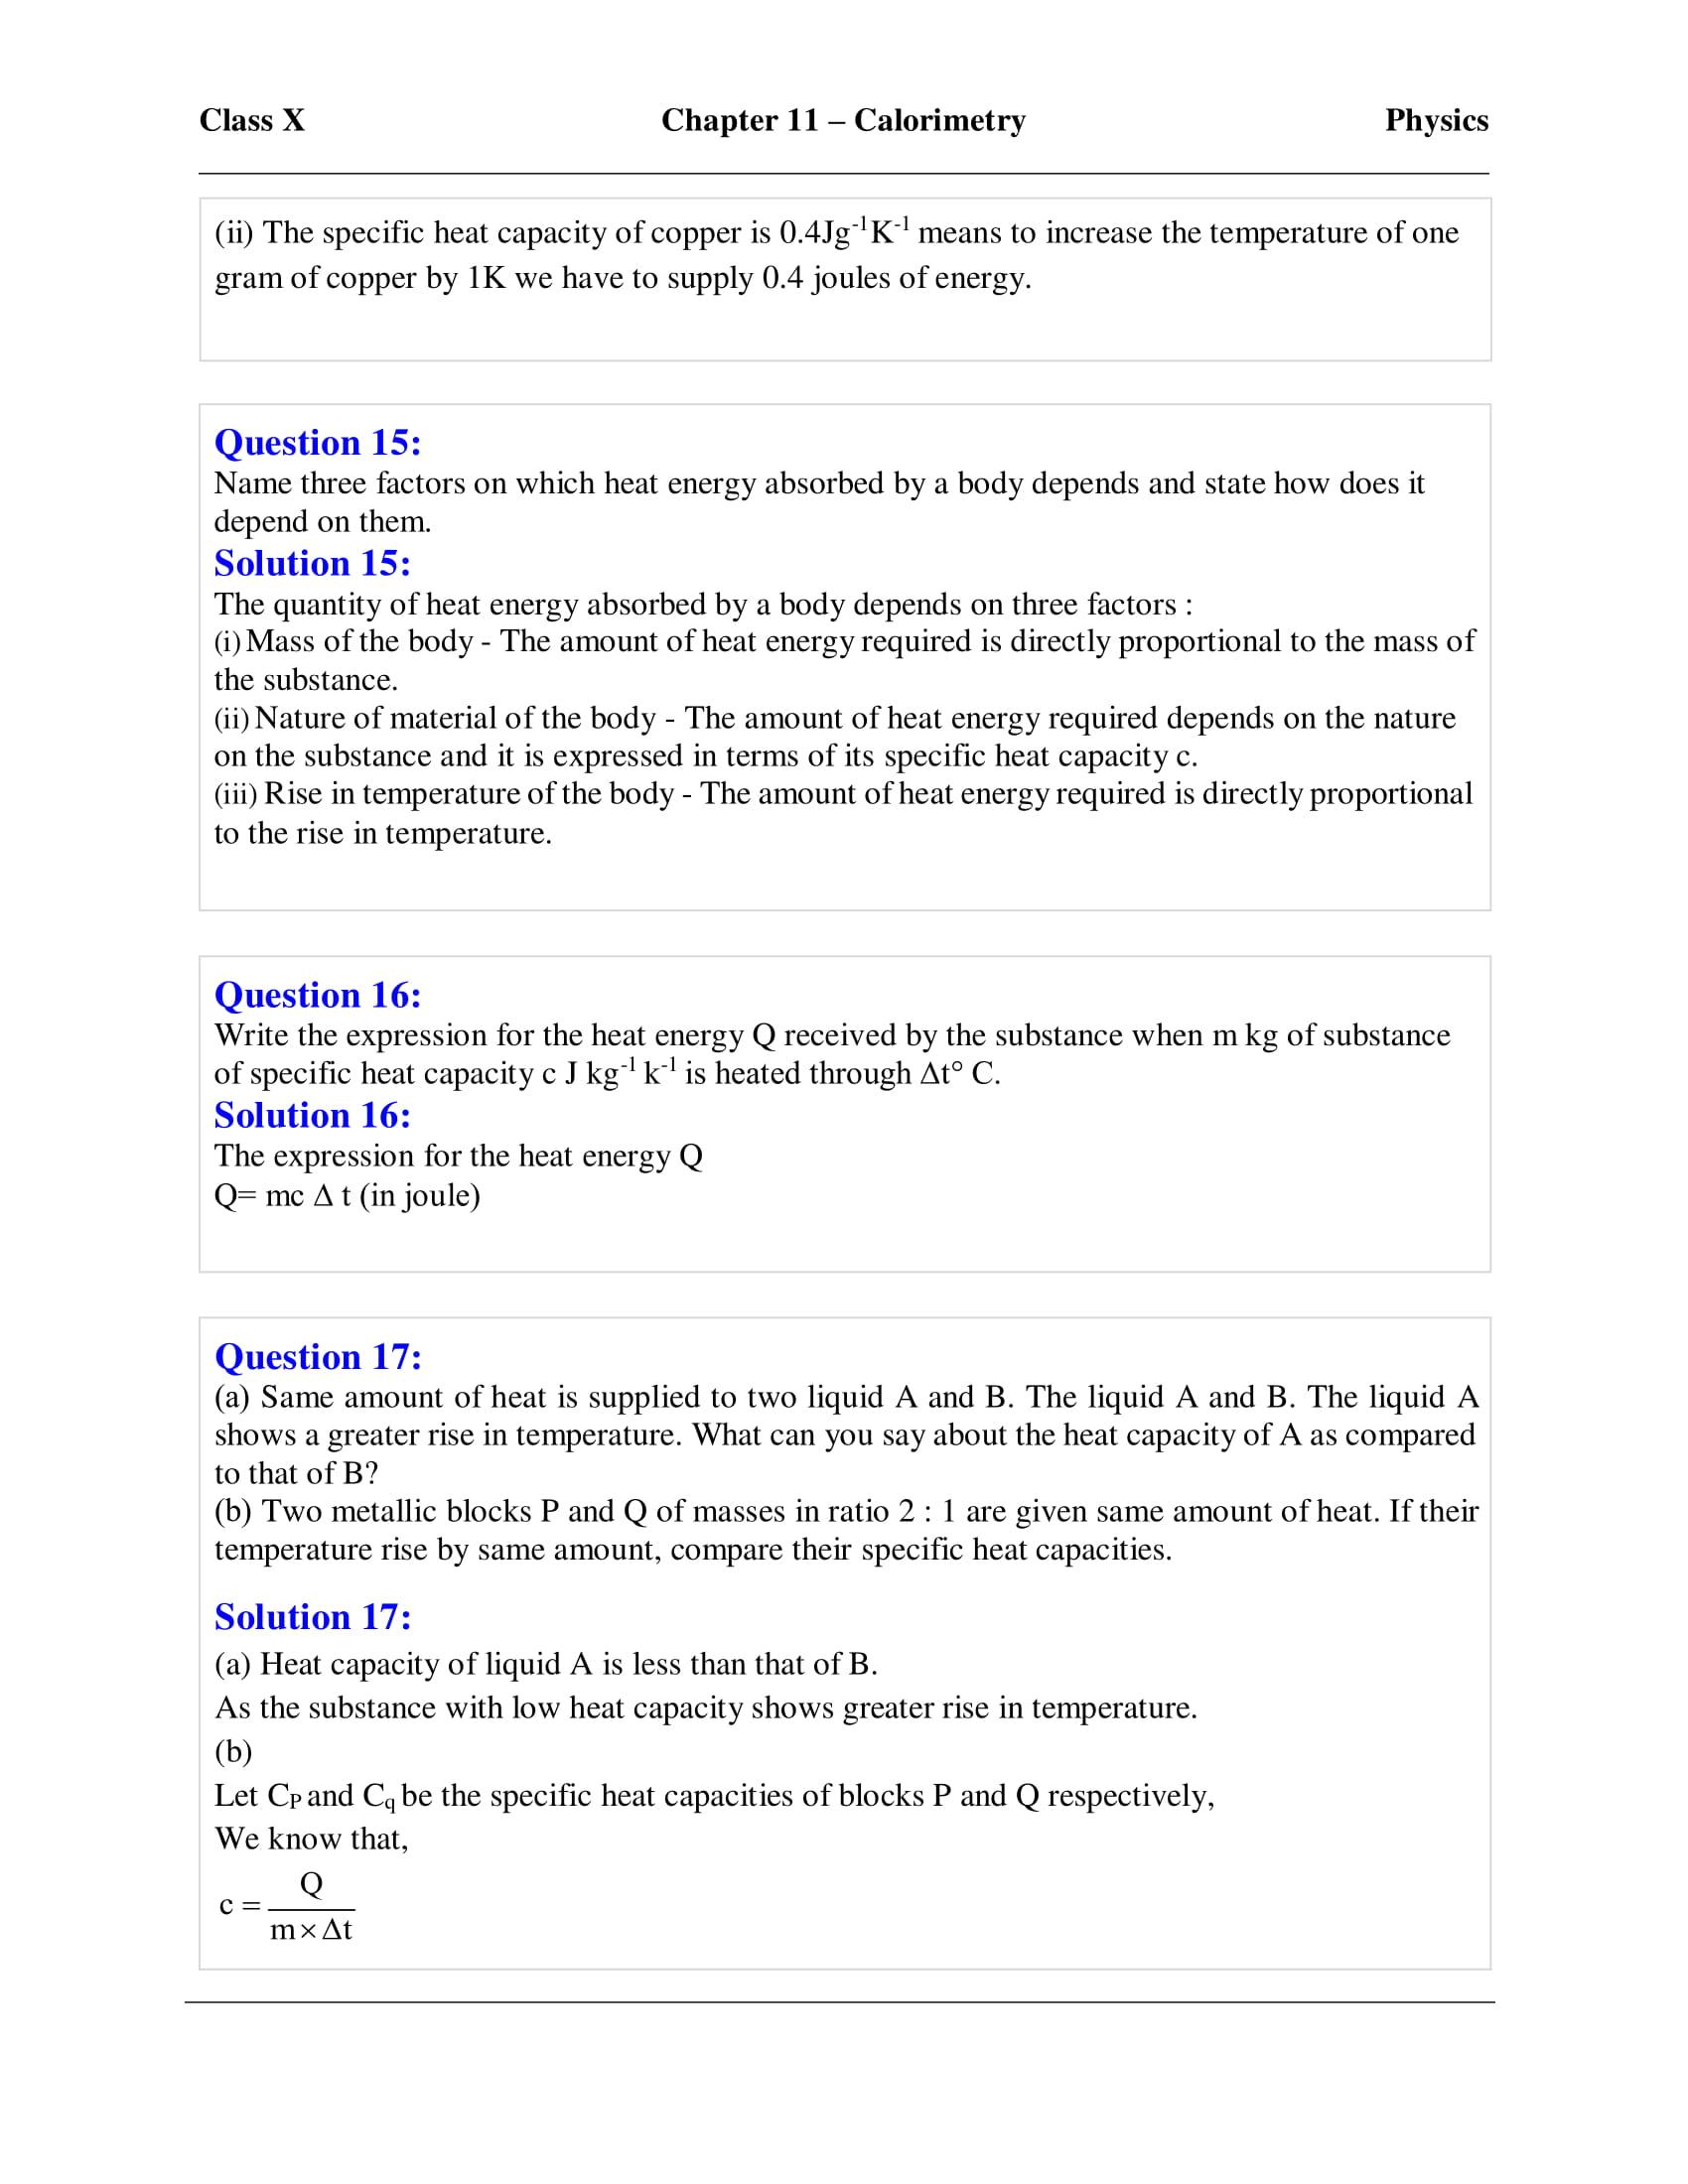 icse-selina-physics-solutions-class-10-chapter-11-calorimetry-04